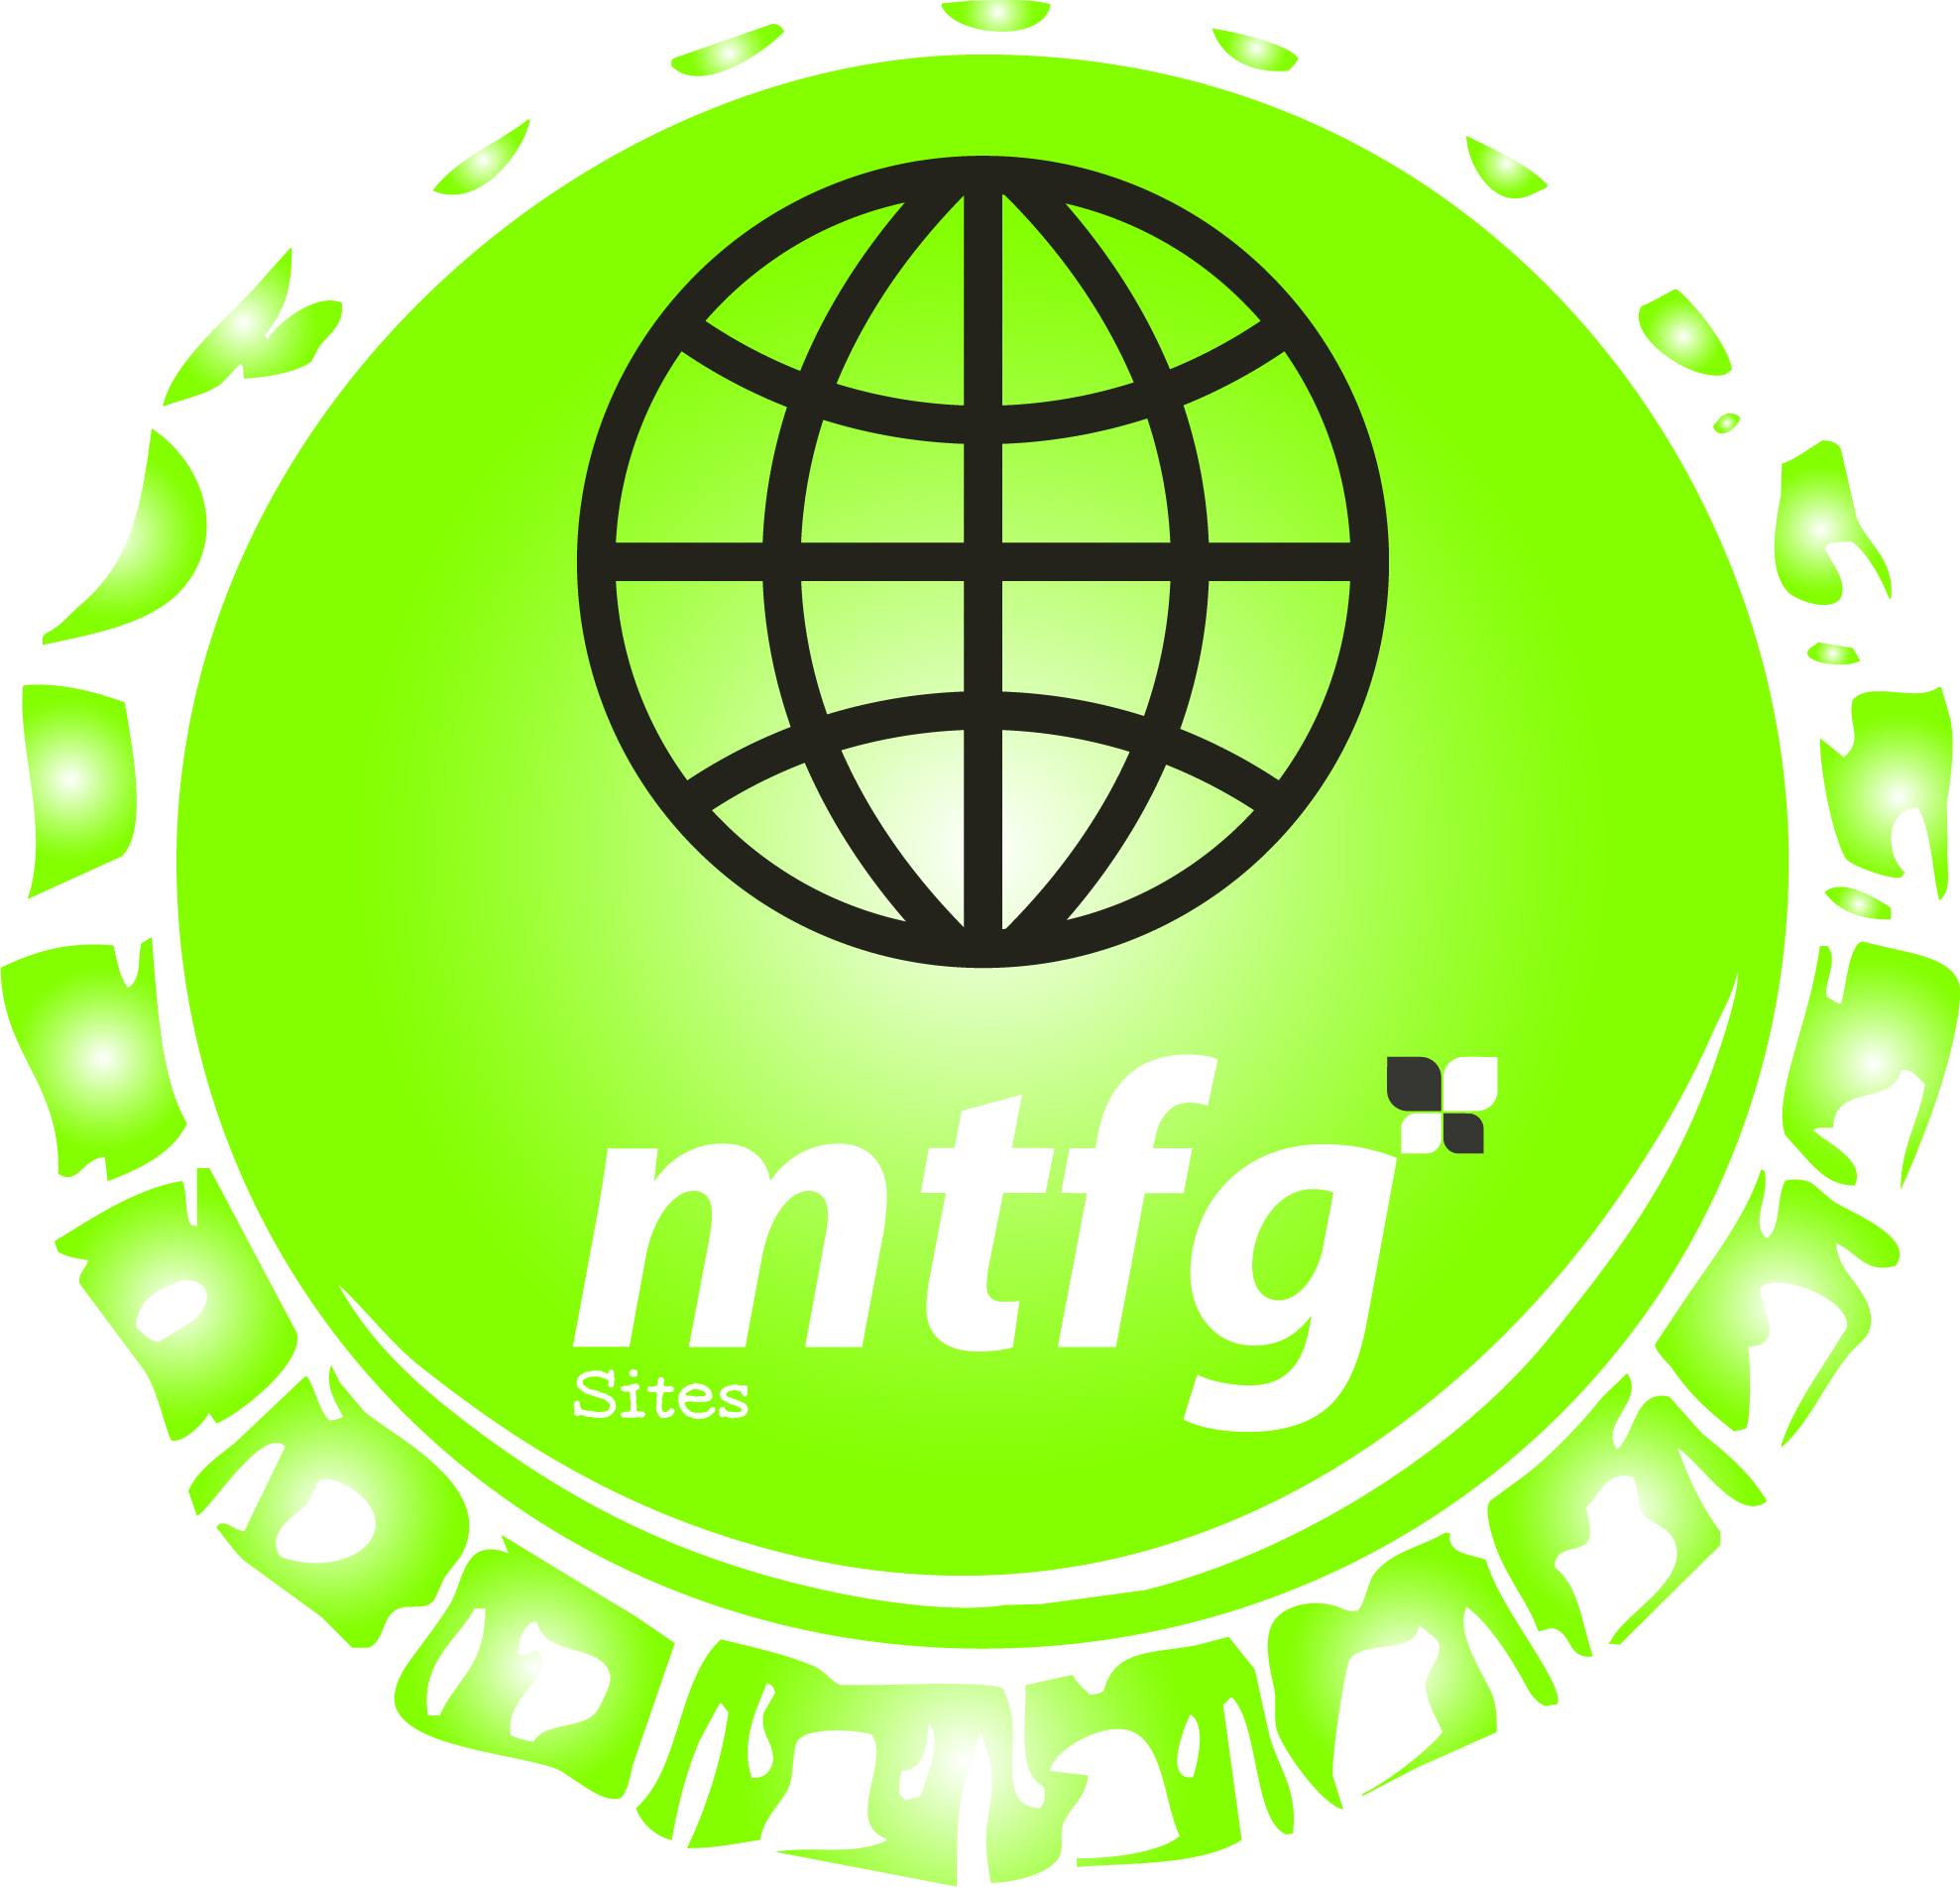 MTFG Sites